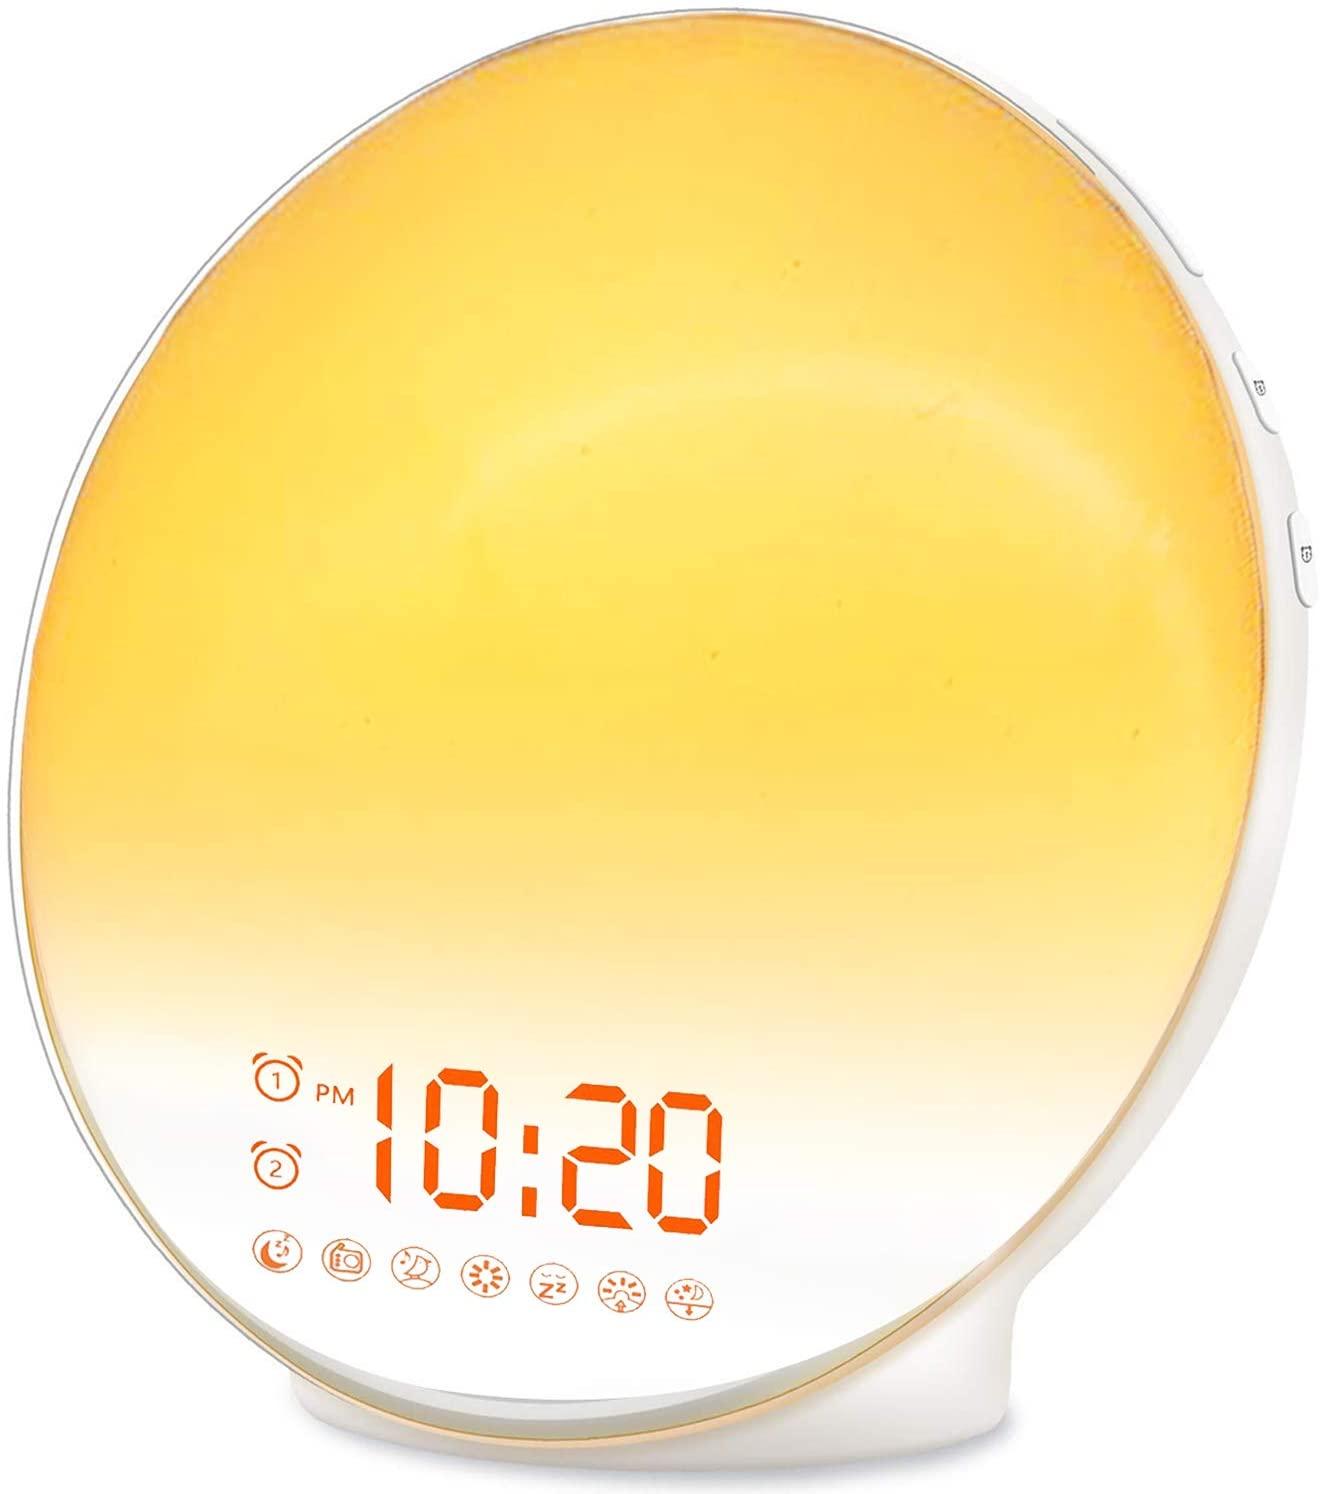 Save 22% on Wake Up Light Sunrise Alarm Clock for Kids, Heavy Sleepers